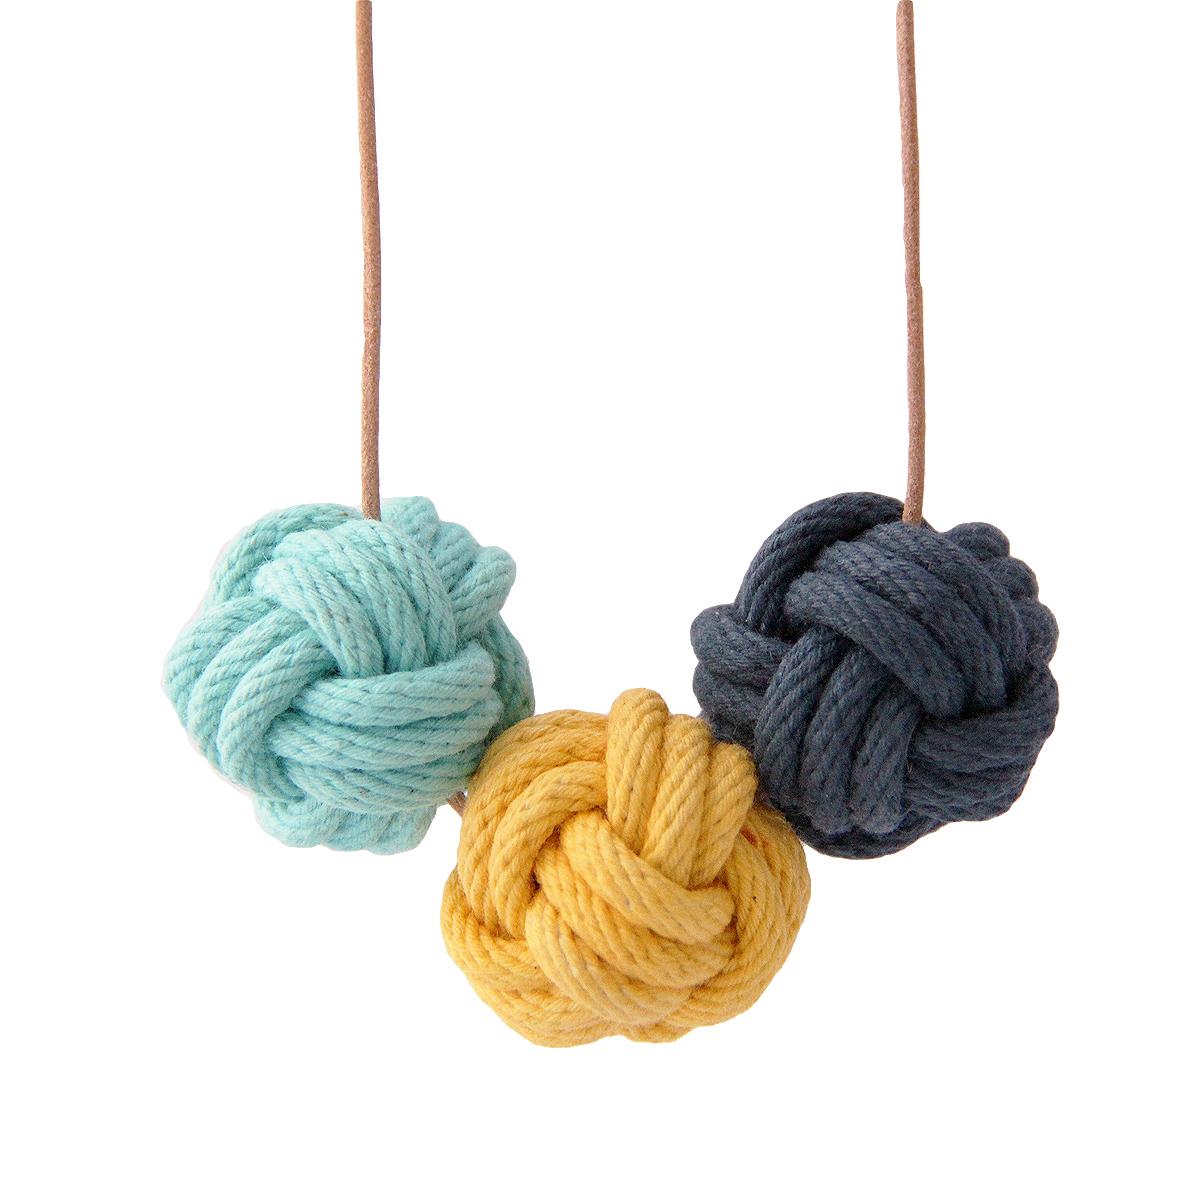 Nautical knot necklace santorini